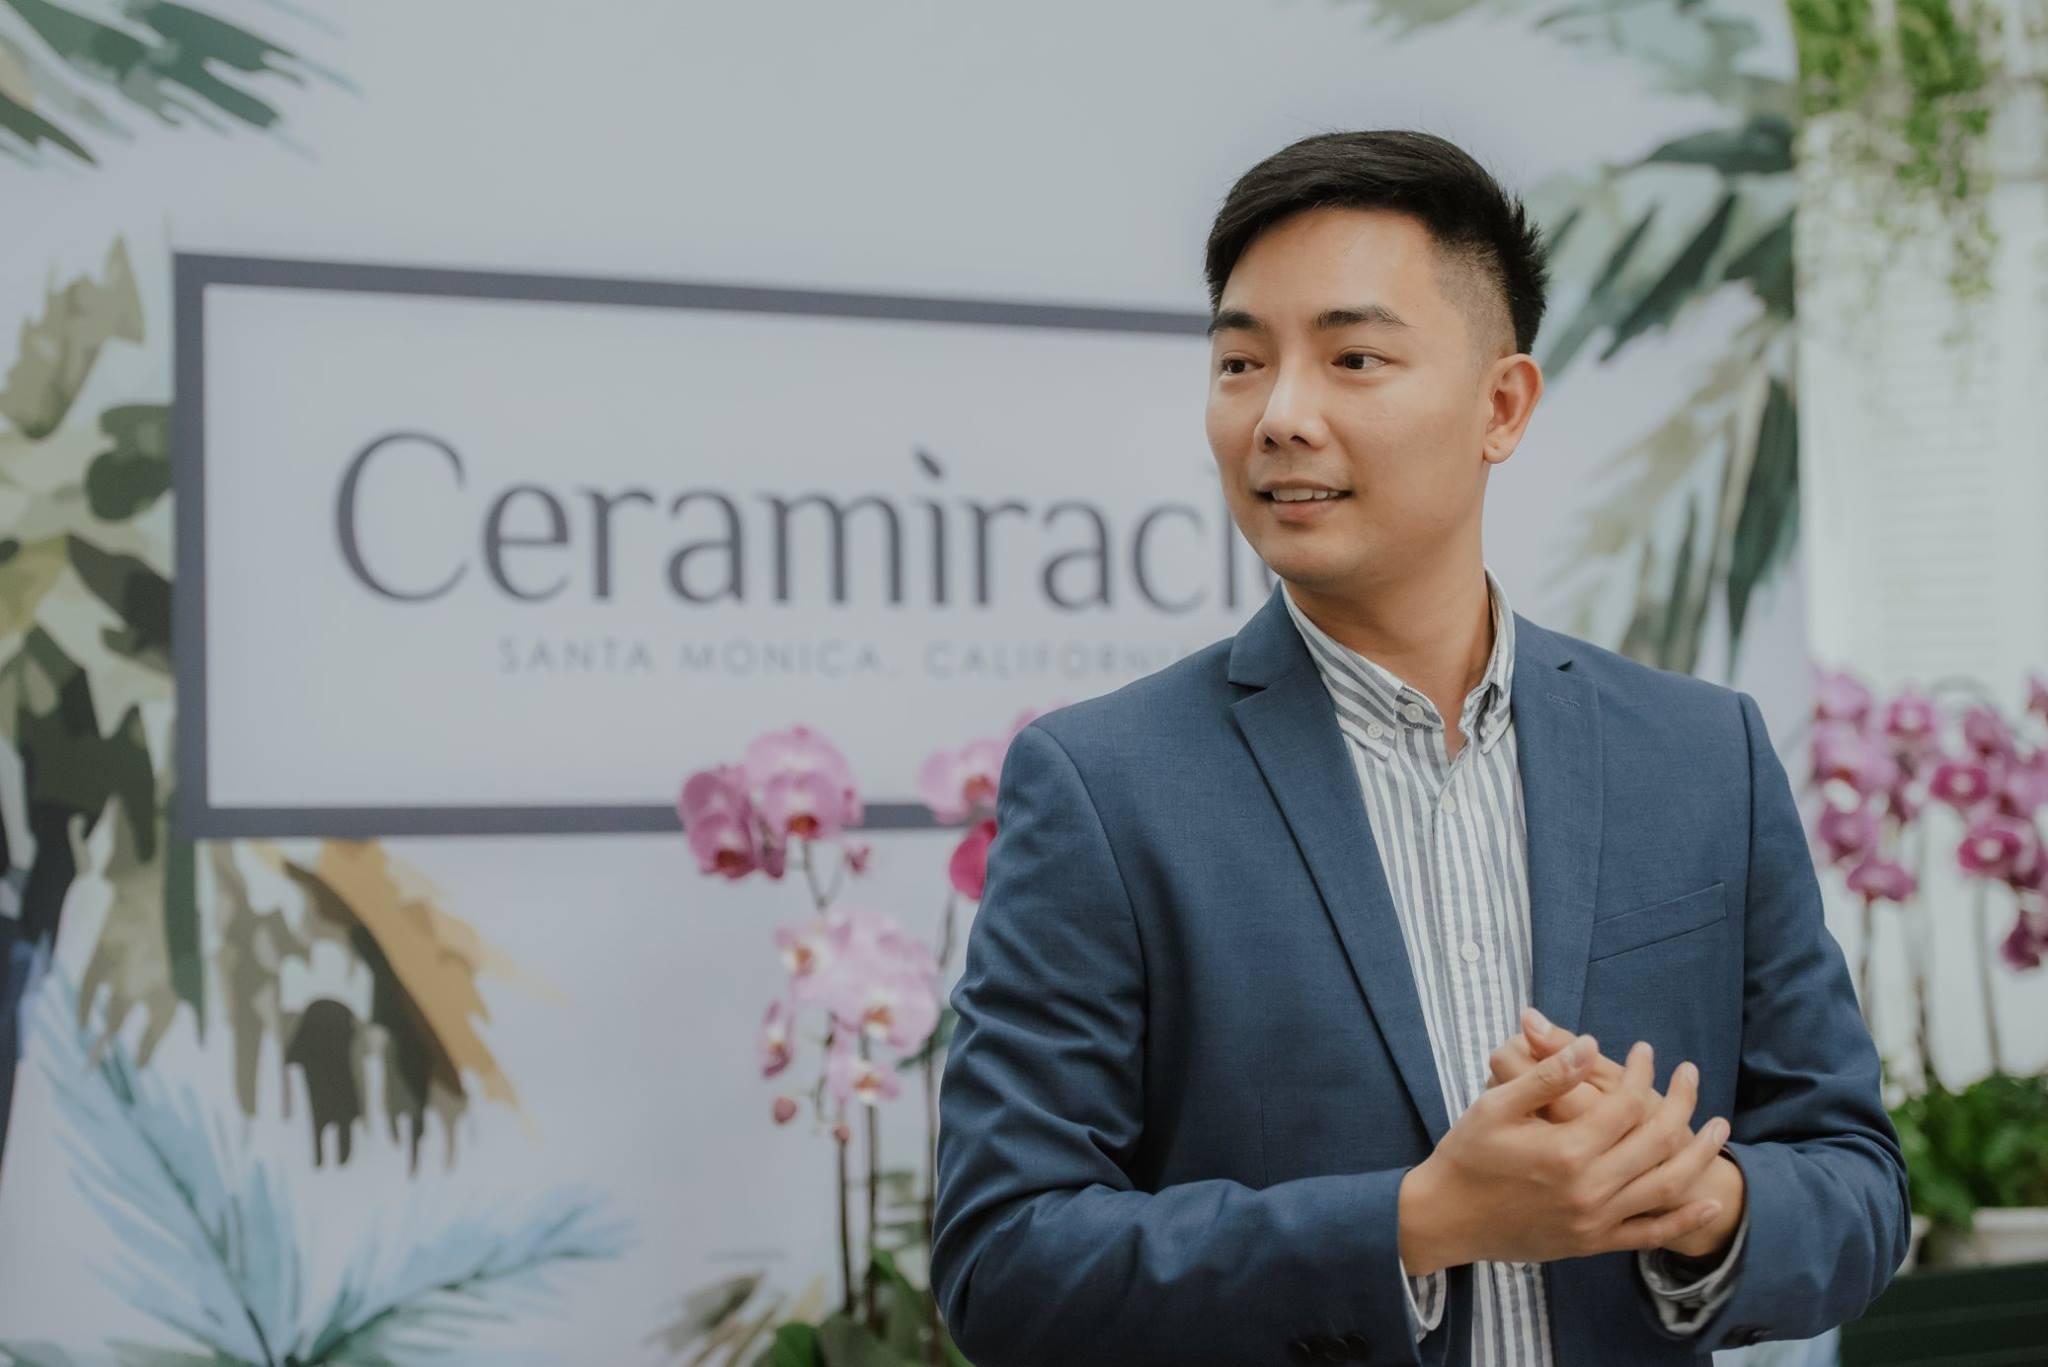 Eugene He, Ceramiracle founder